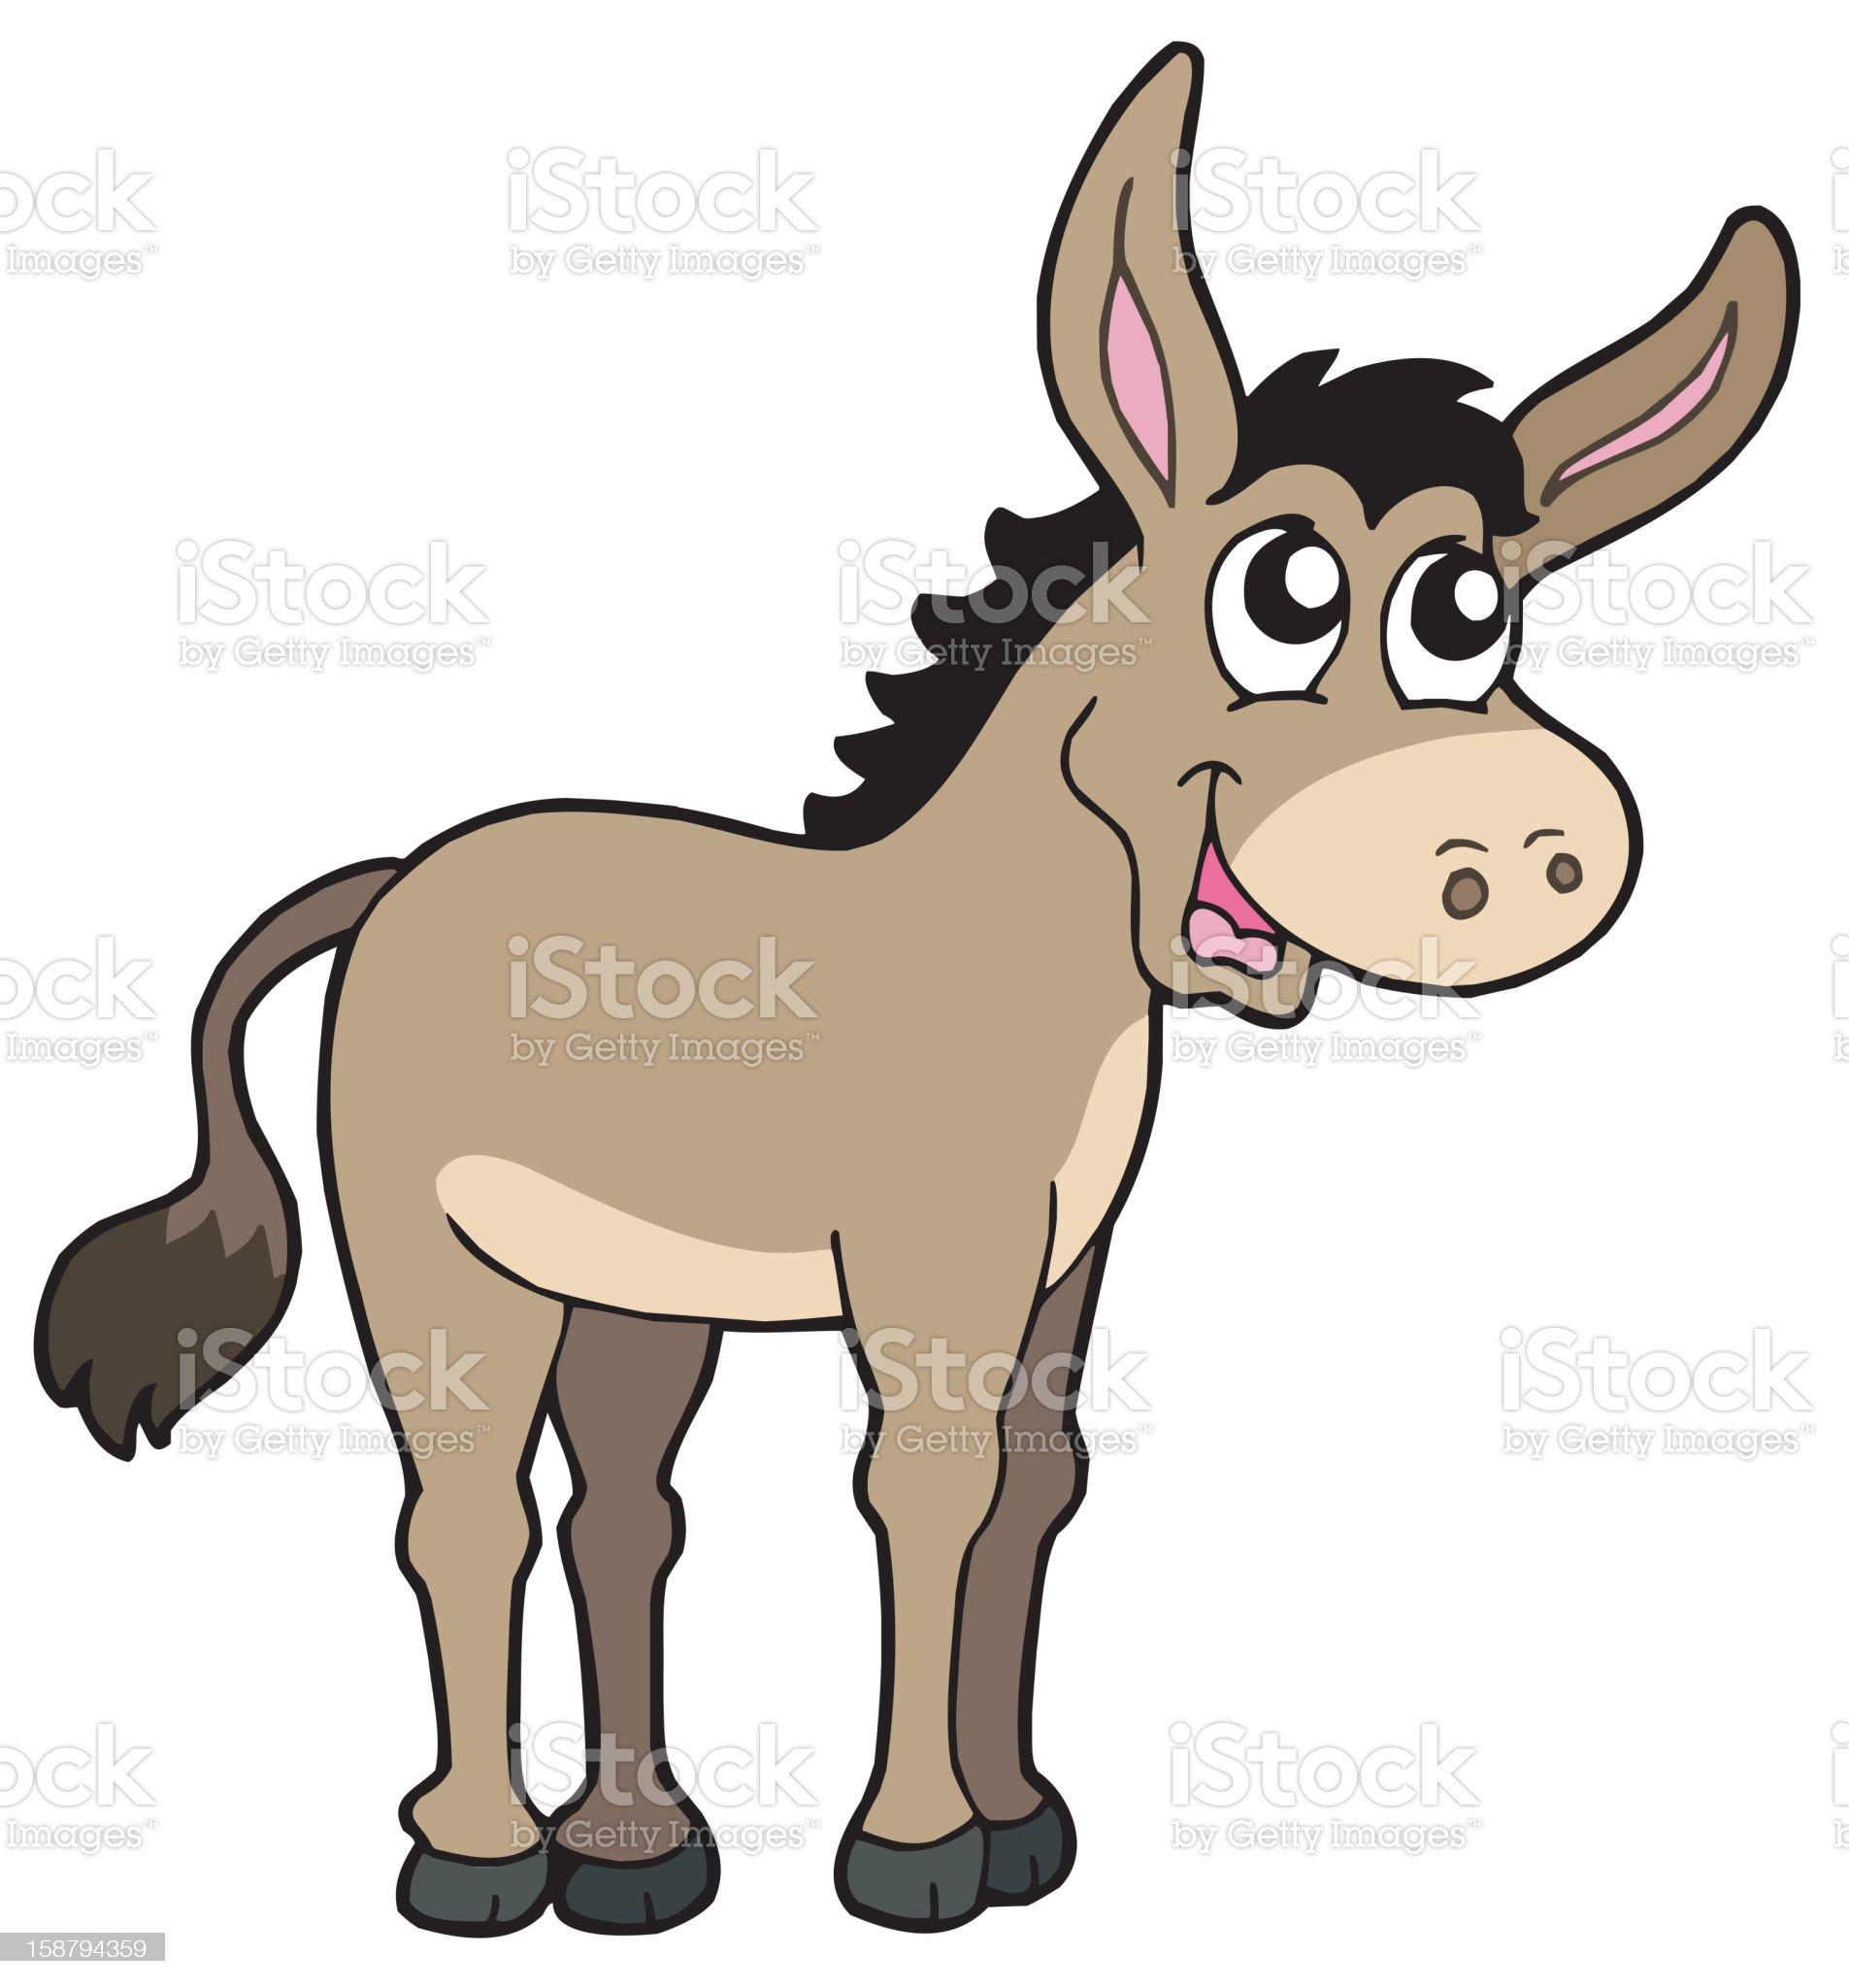 Cute donkey royalty-free stock vector art